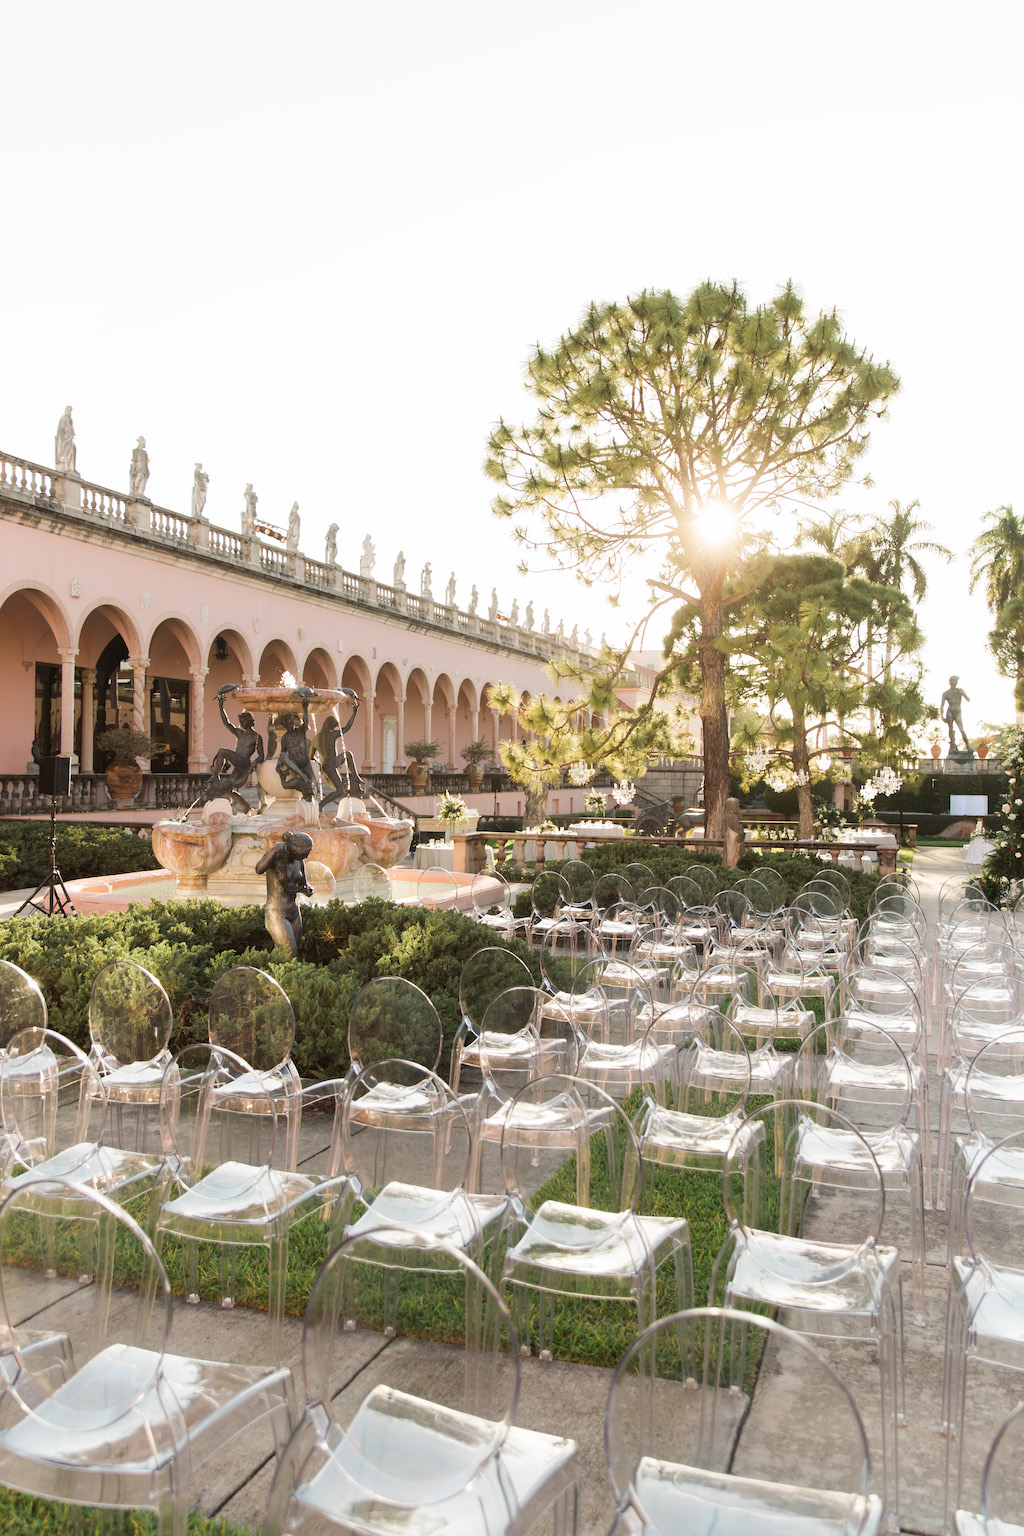 Elegant Modern Garden Courtyard Ceremony Decor, Ghost Chairs | Sarasota Wedding Venue Ringling Museum | Tampa Bay Wedding Planner NK Weddings